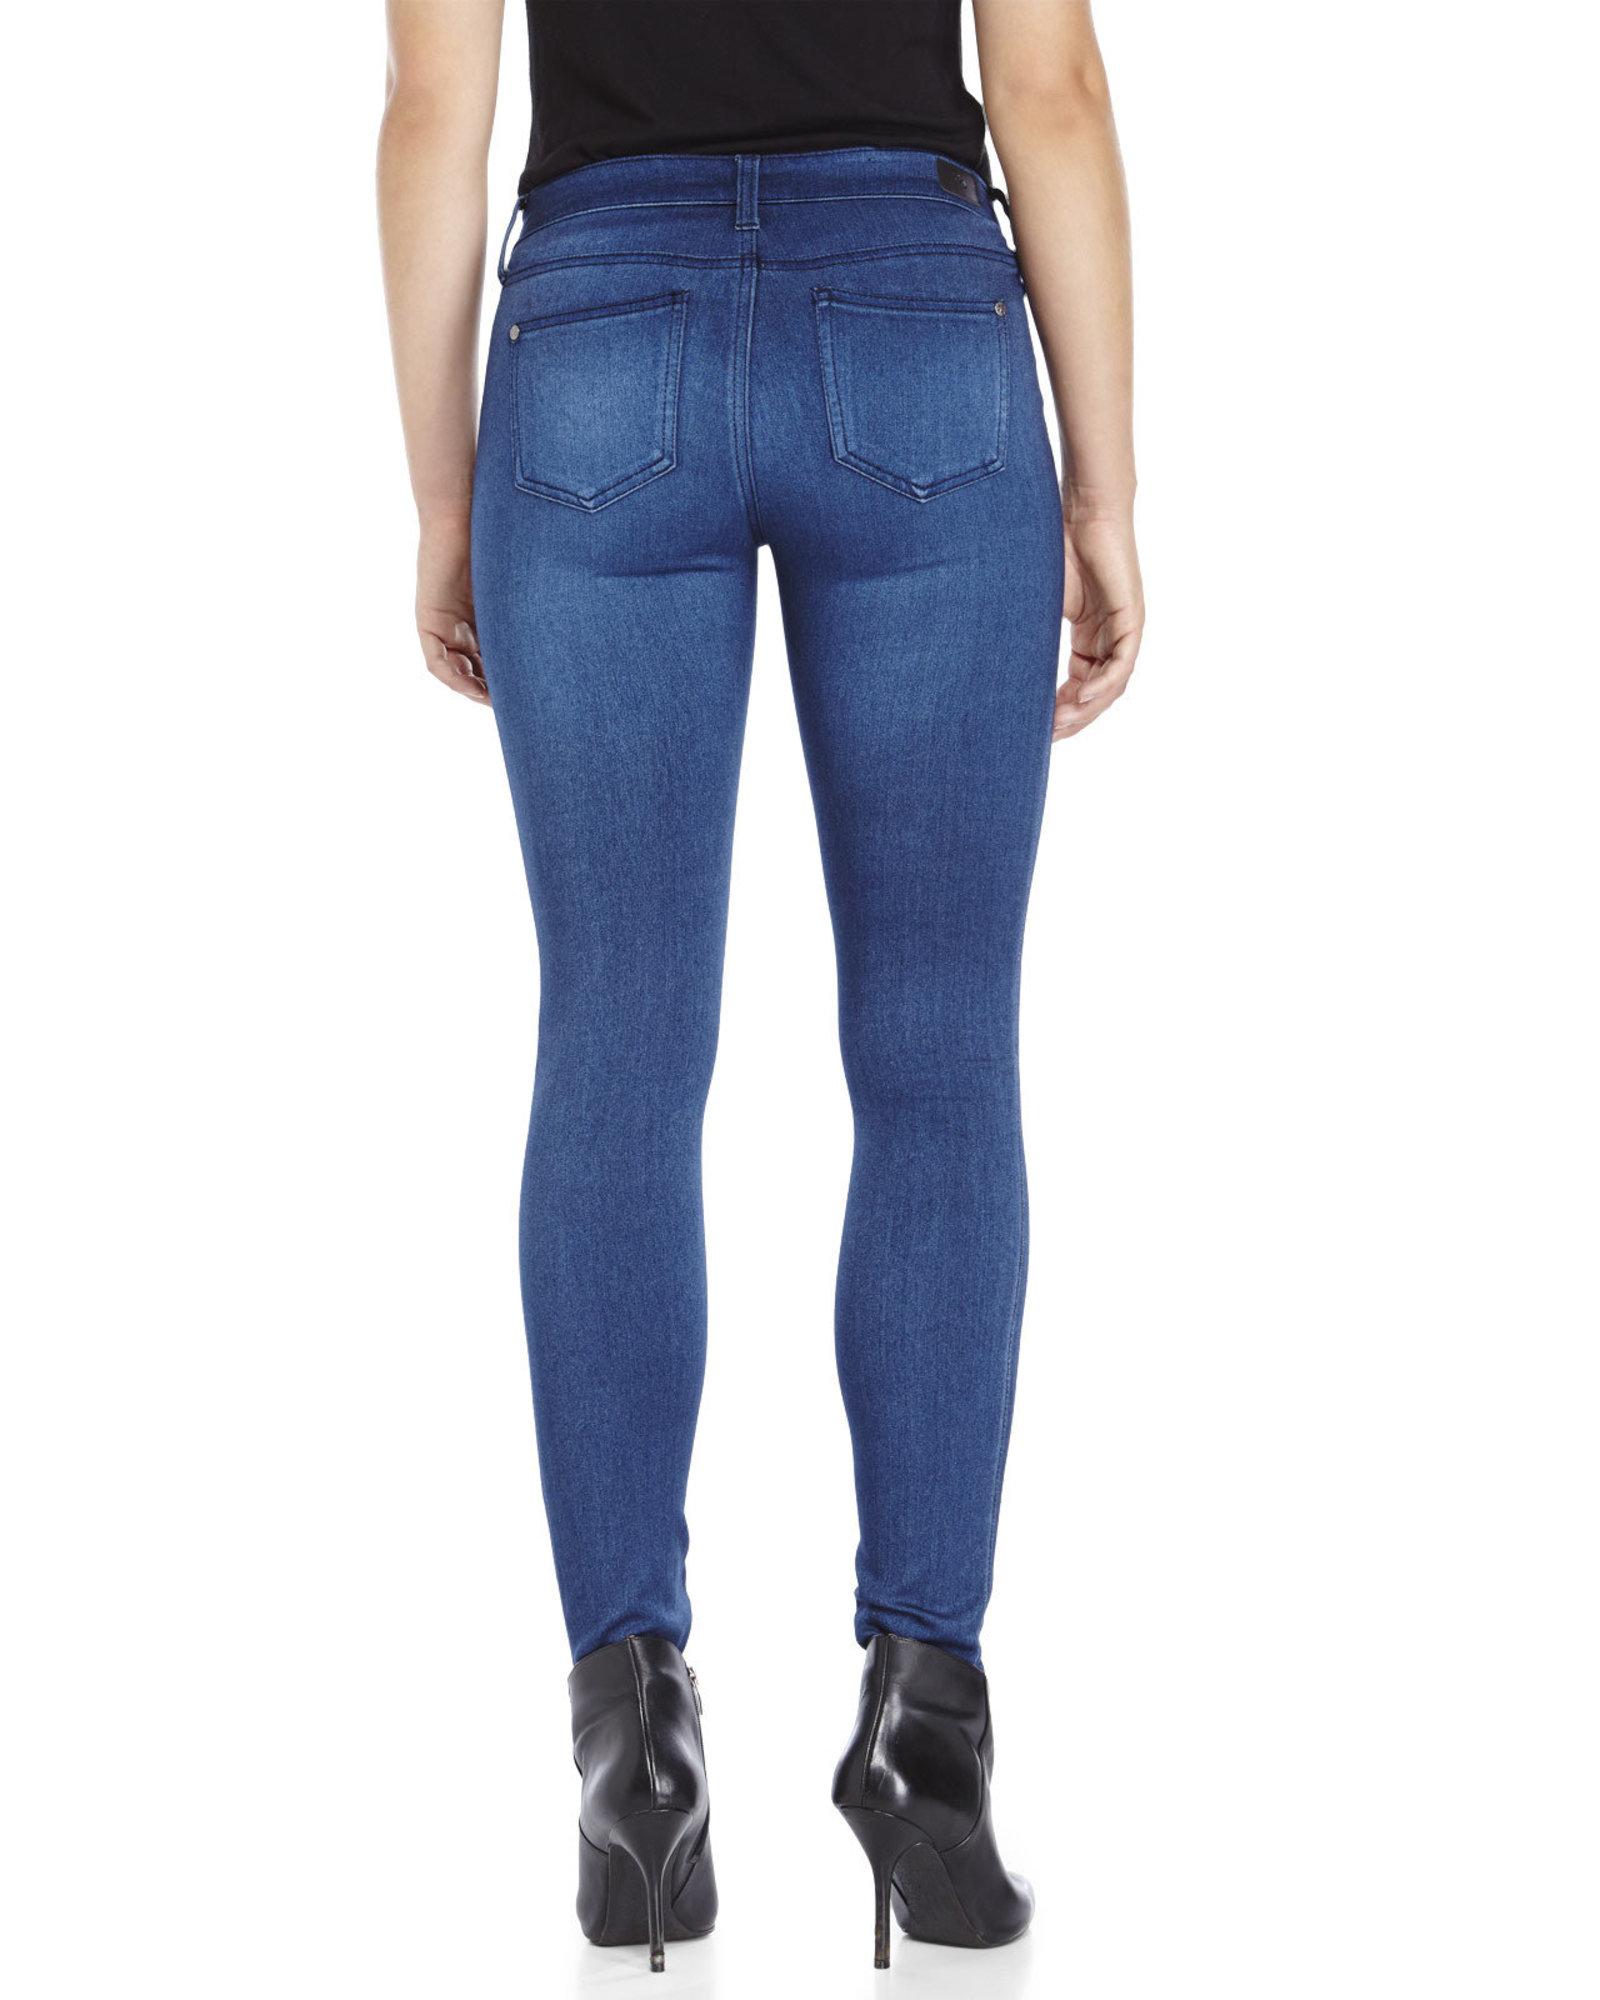 Girls Jeans | Amazon.com